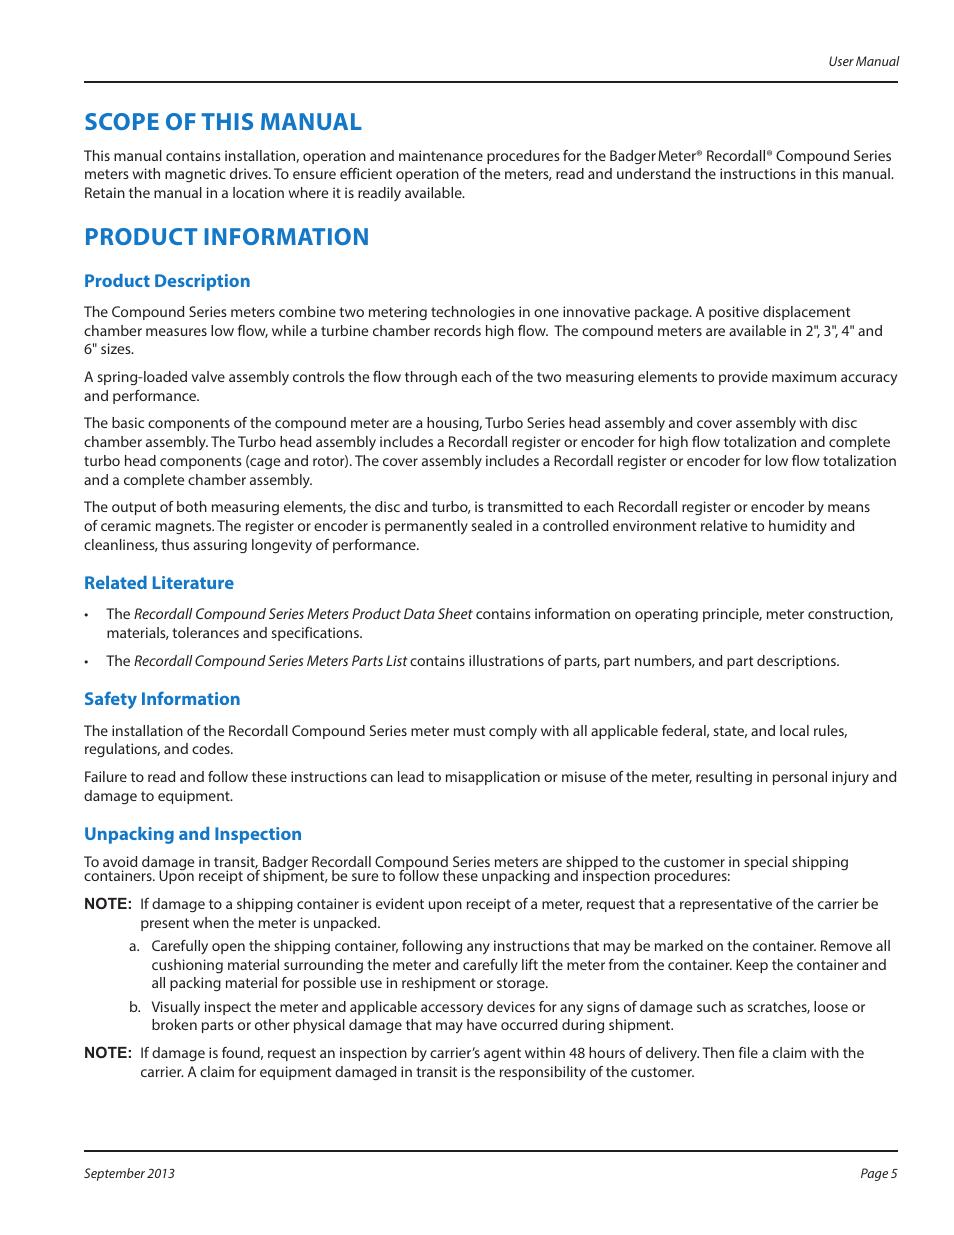 Badger Meter Compound Series User Manual Manual Guide